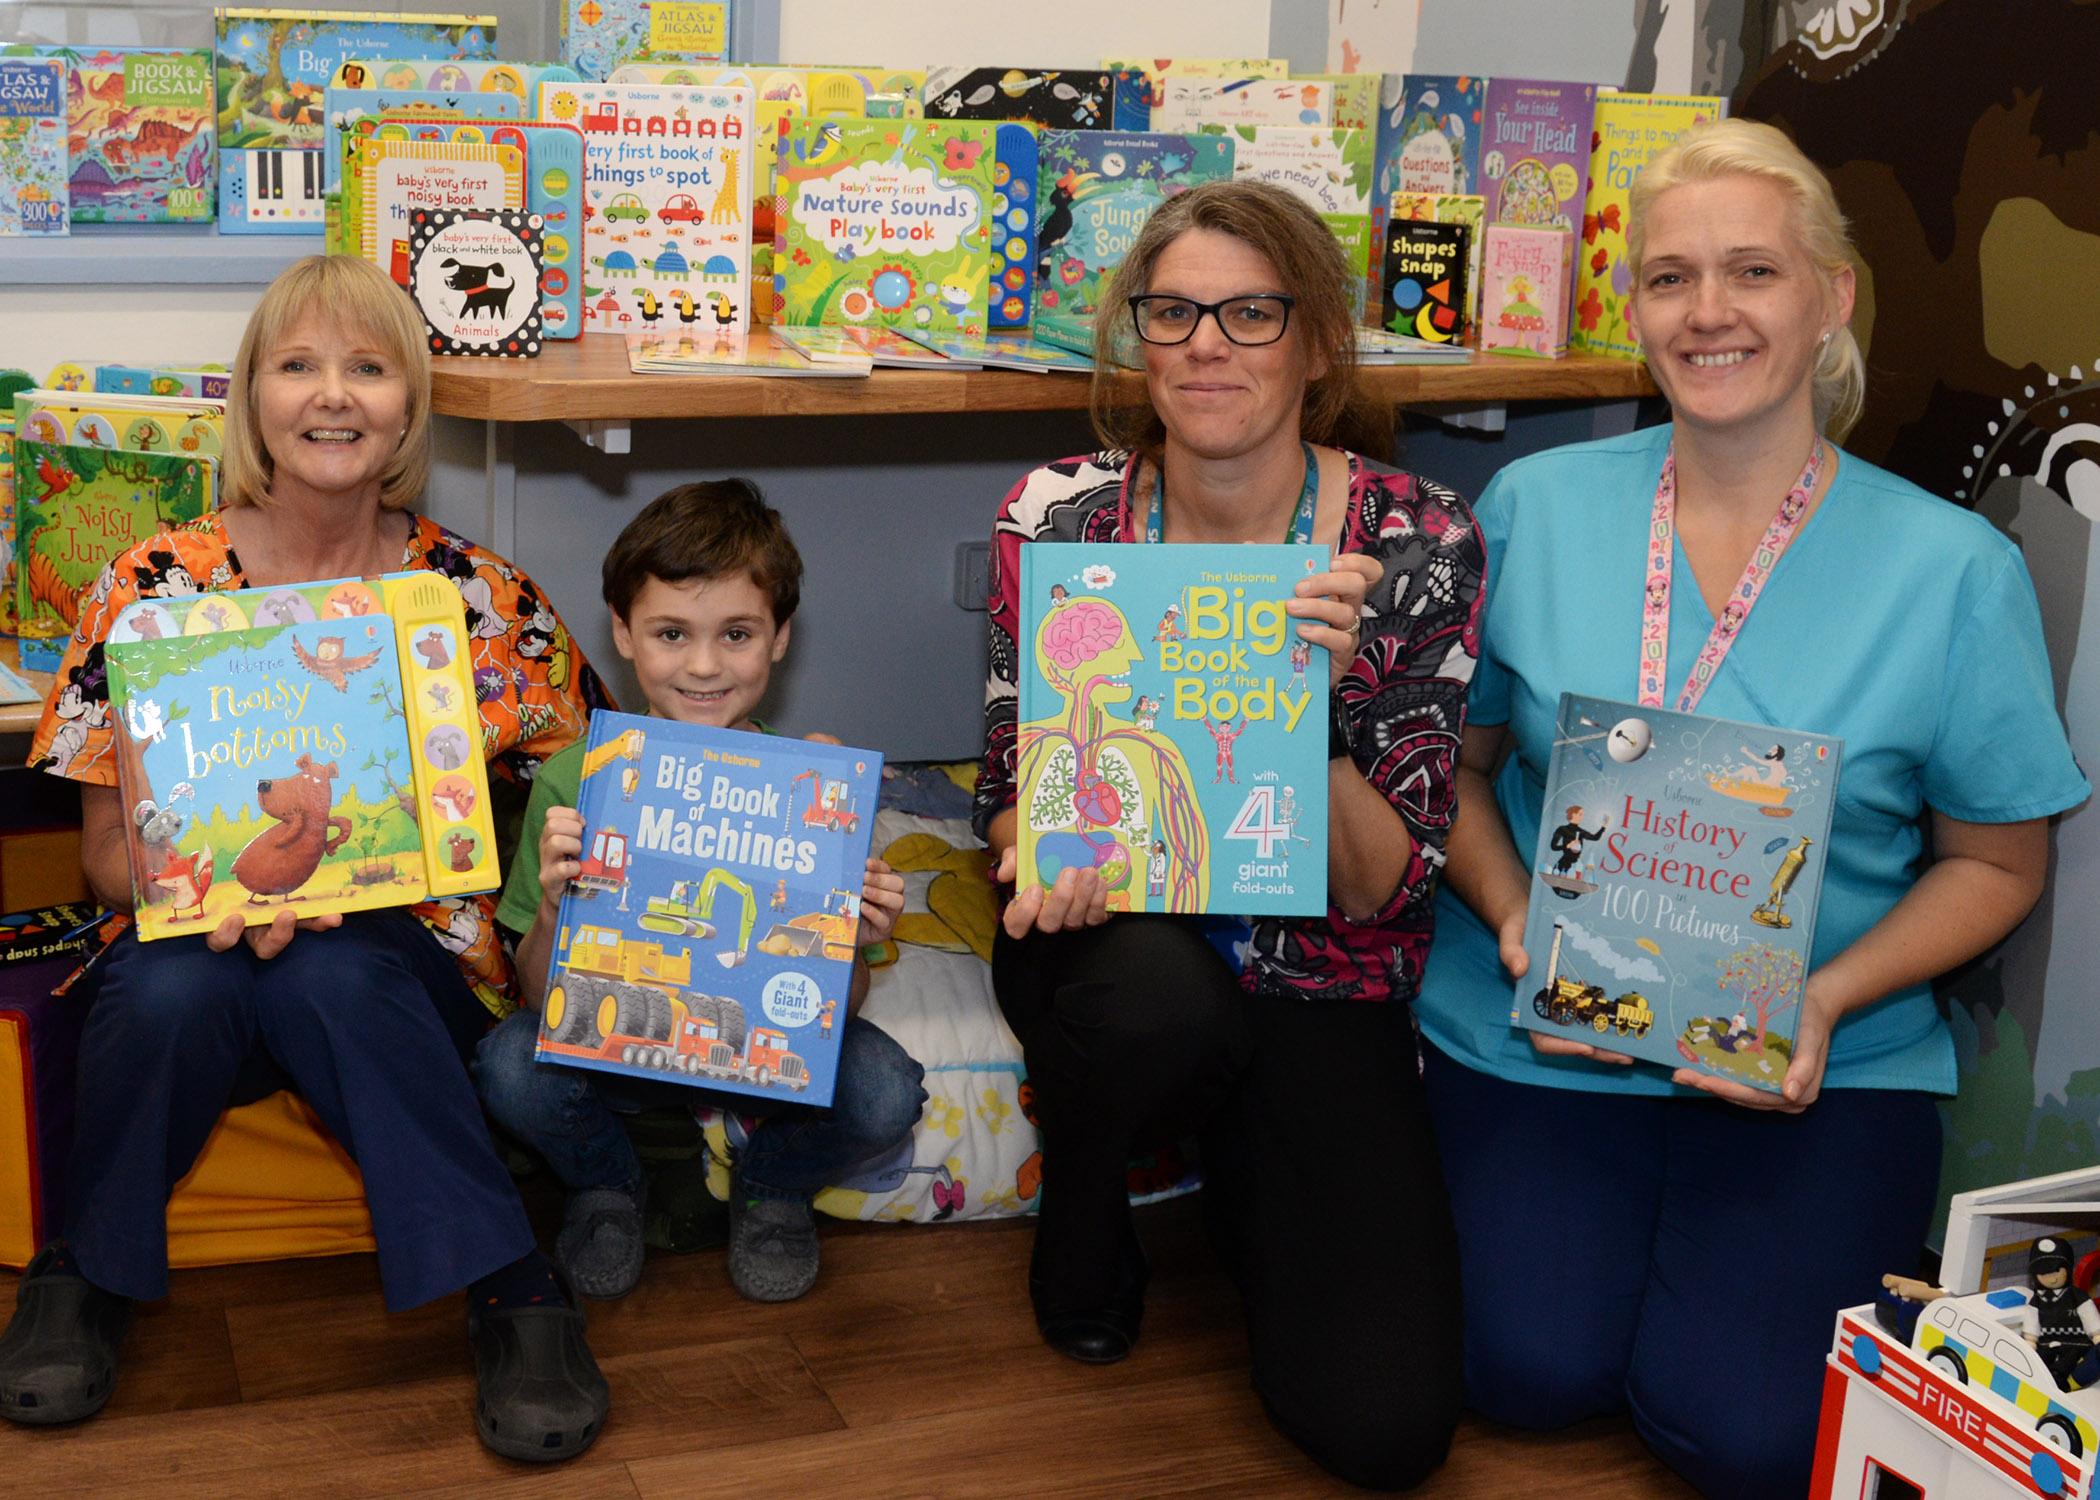 Becky Coles, an Usborne Books Seller raised money to buy books for the Children's Department.